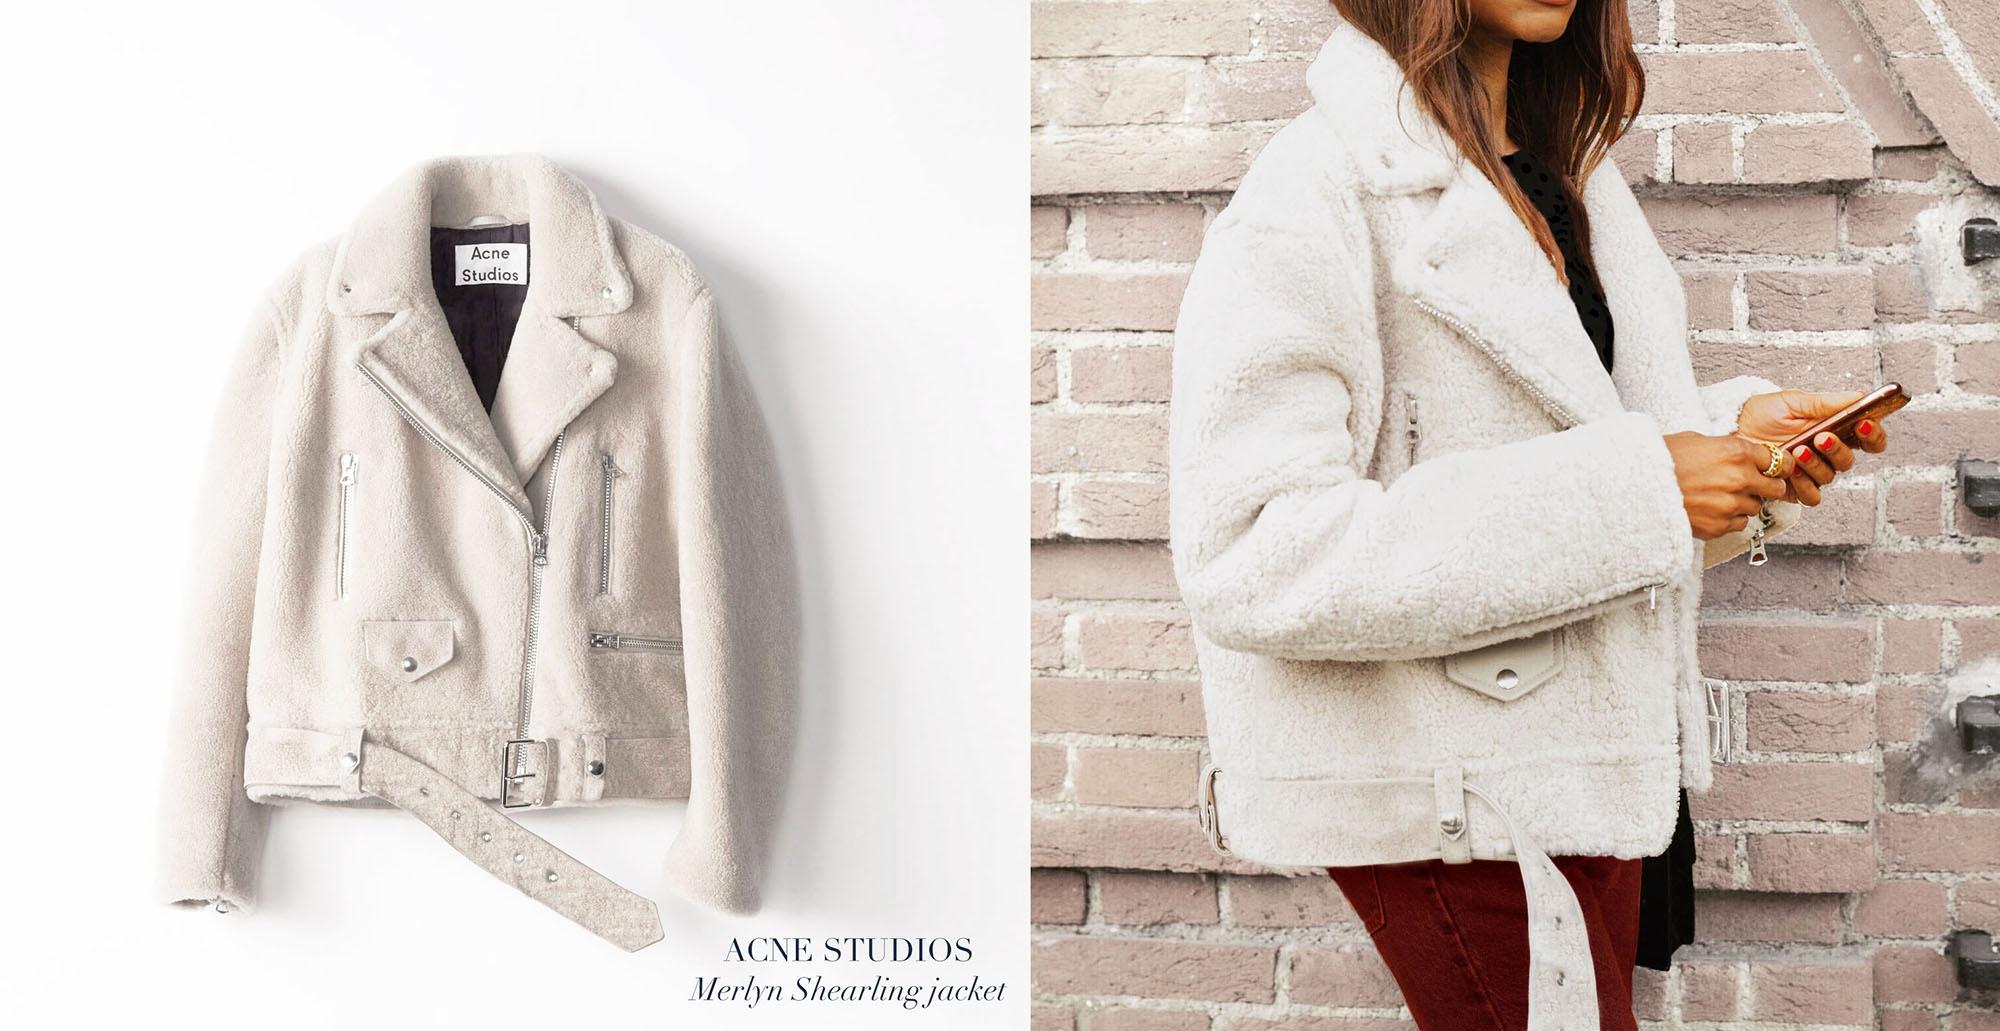 Veste biker shearling jacket MERLYN blanc ivoire Prix boutique 1900€ Taille  36 38 567d2eb2dd1